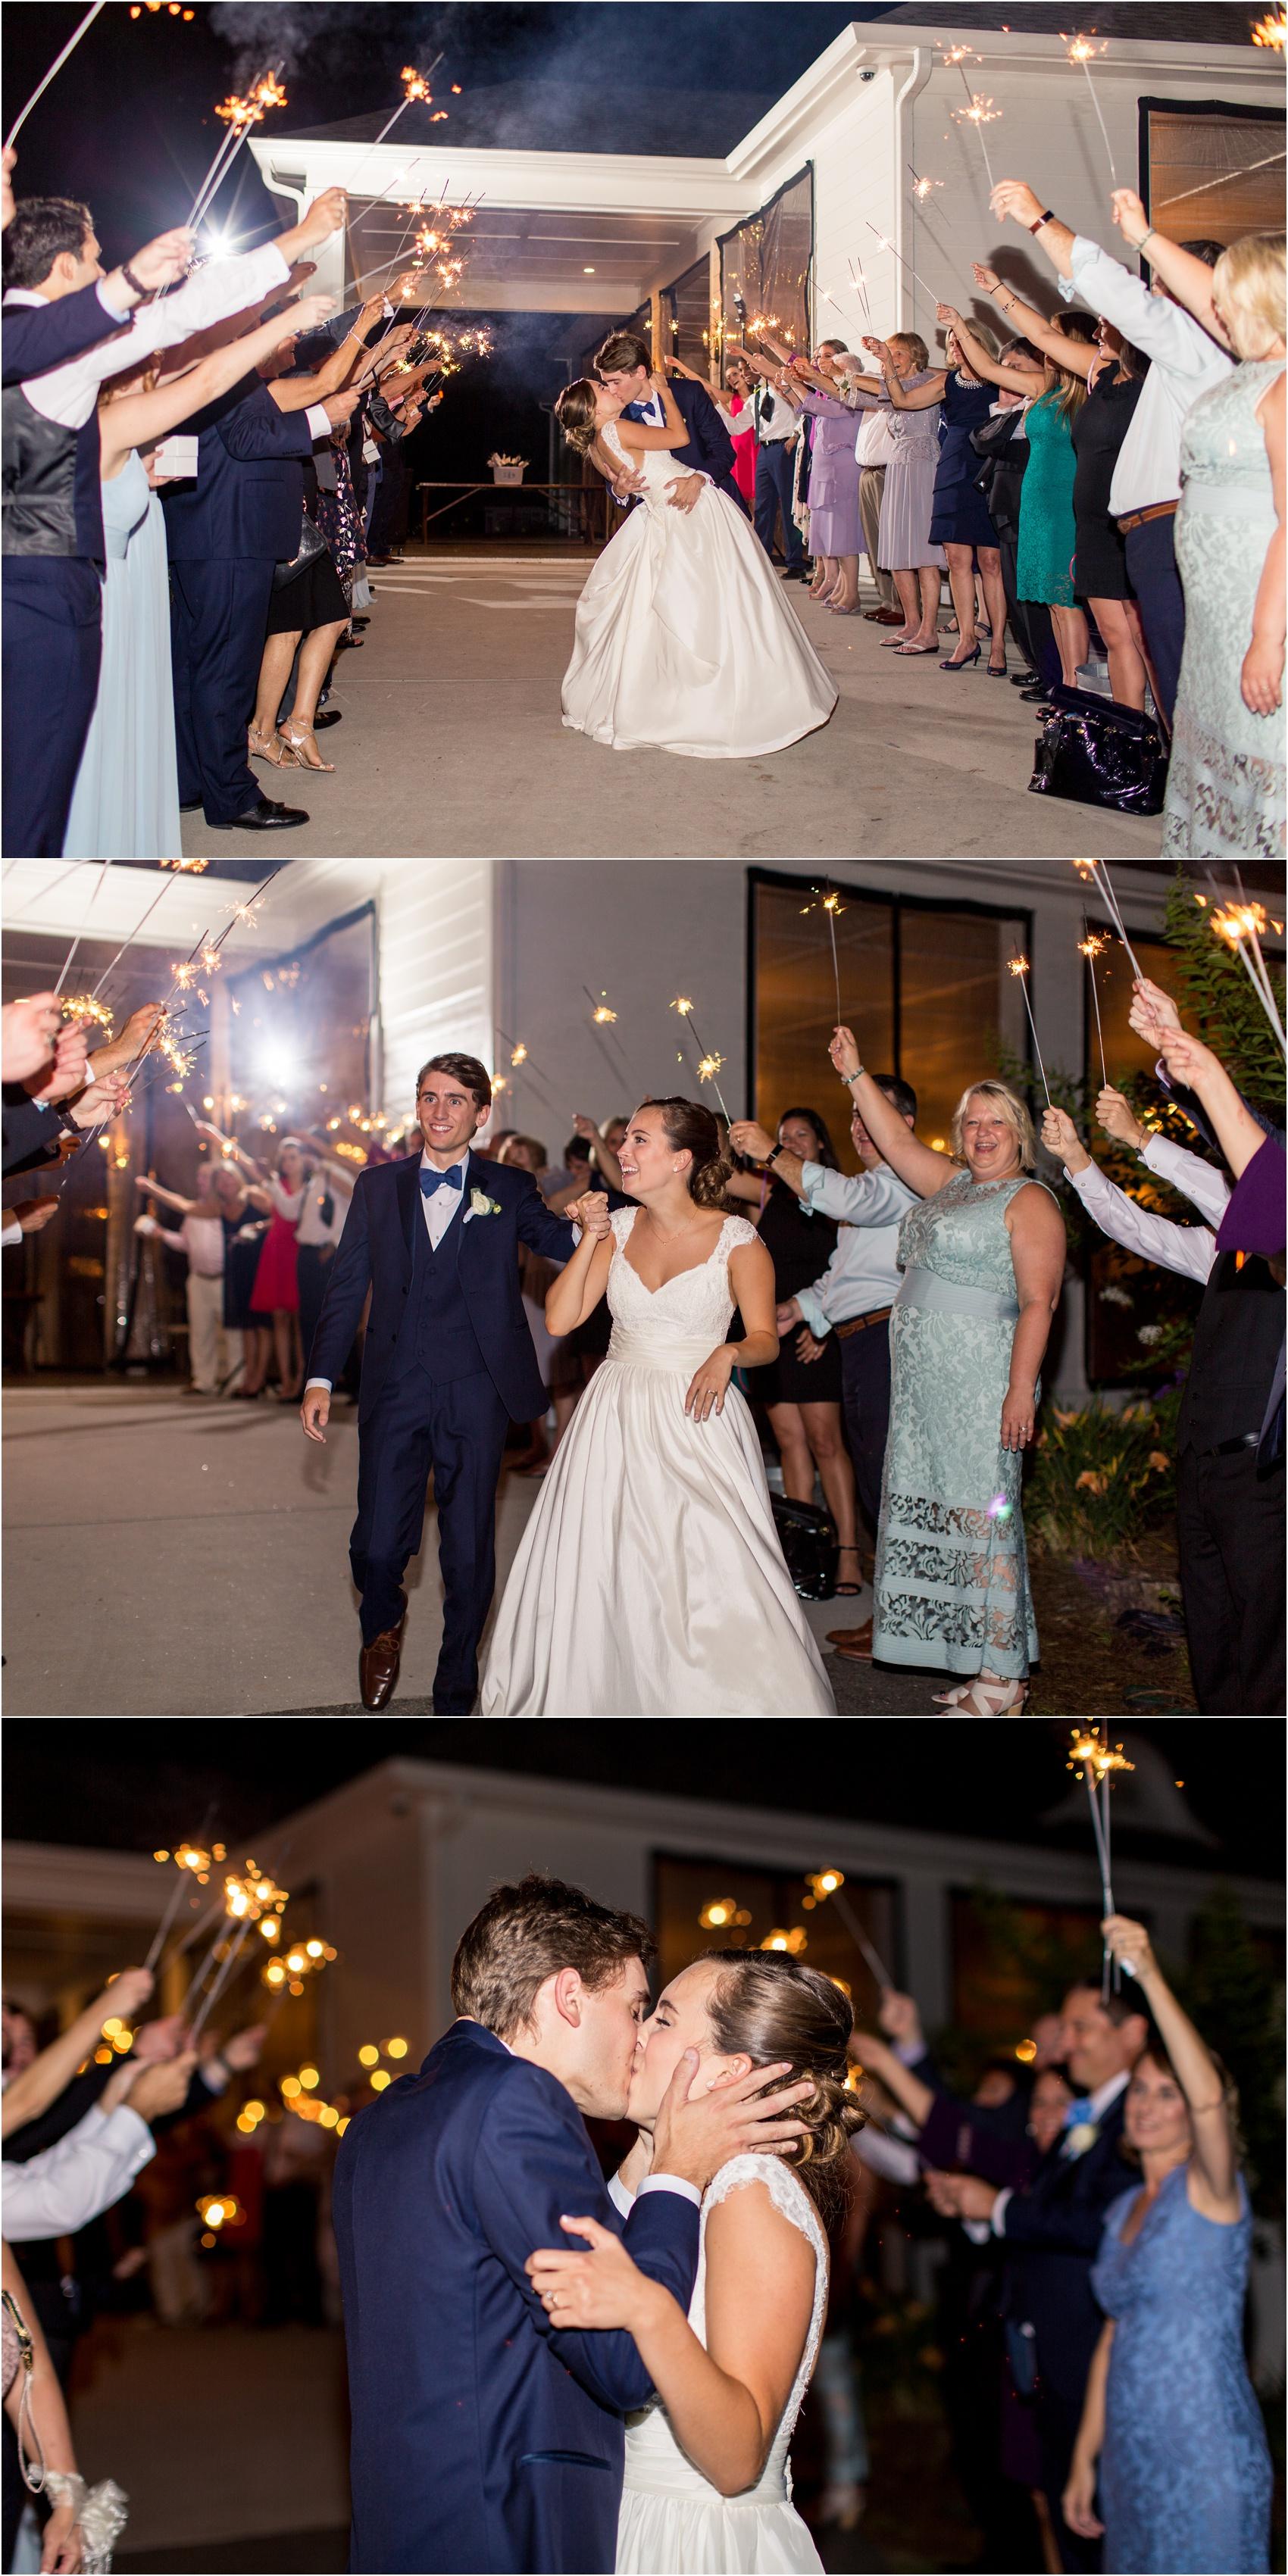 Savannah Eve Photography- Sigl-Adams Wedding- Sneak Peek-99.jpg